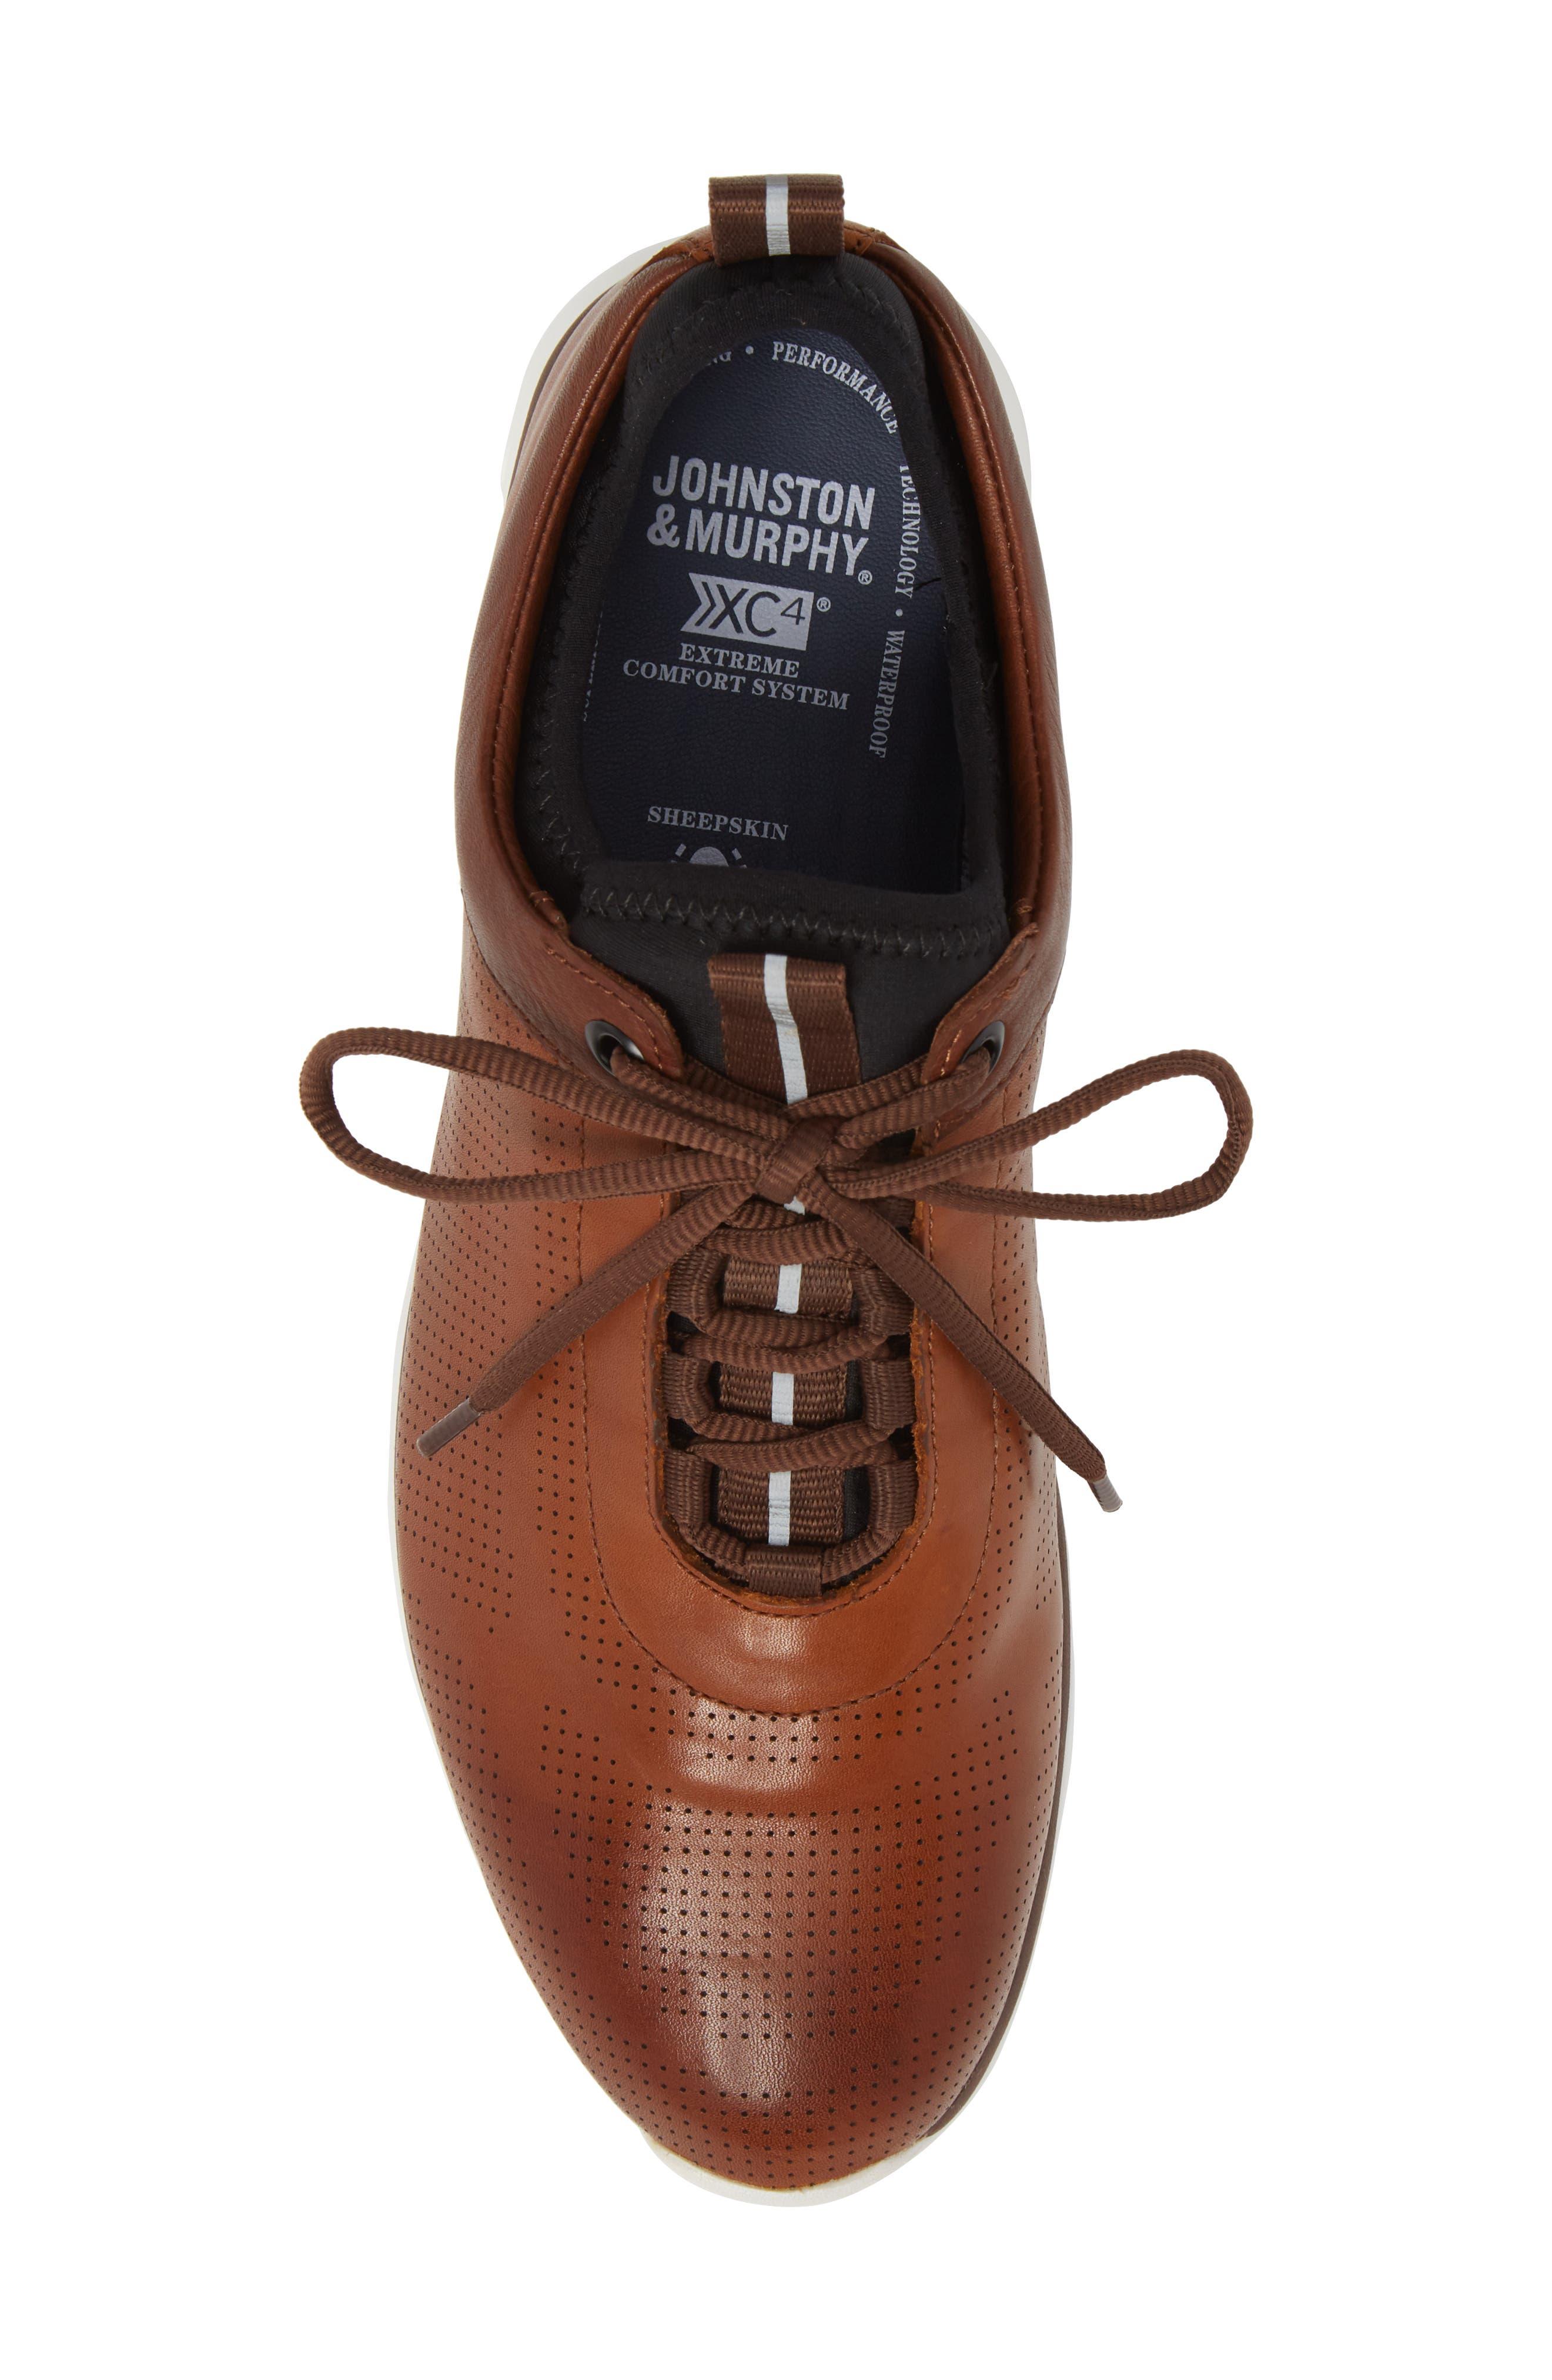 JOHNSTON & MURPHY, Prentiss XC4<sup>®</sup> Waterproof Sneaker, Alternate thumbnail 5, color, MAHOGANY LEATHER